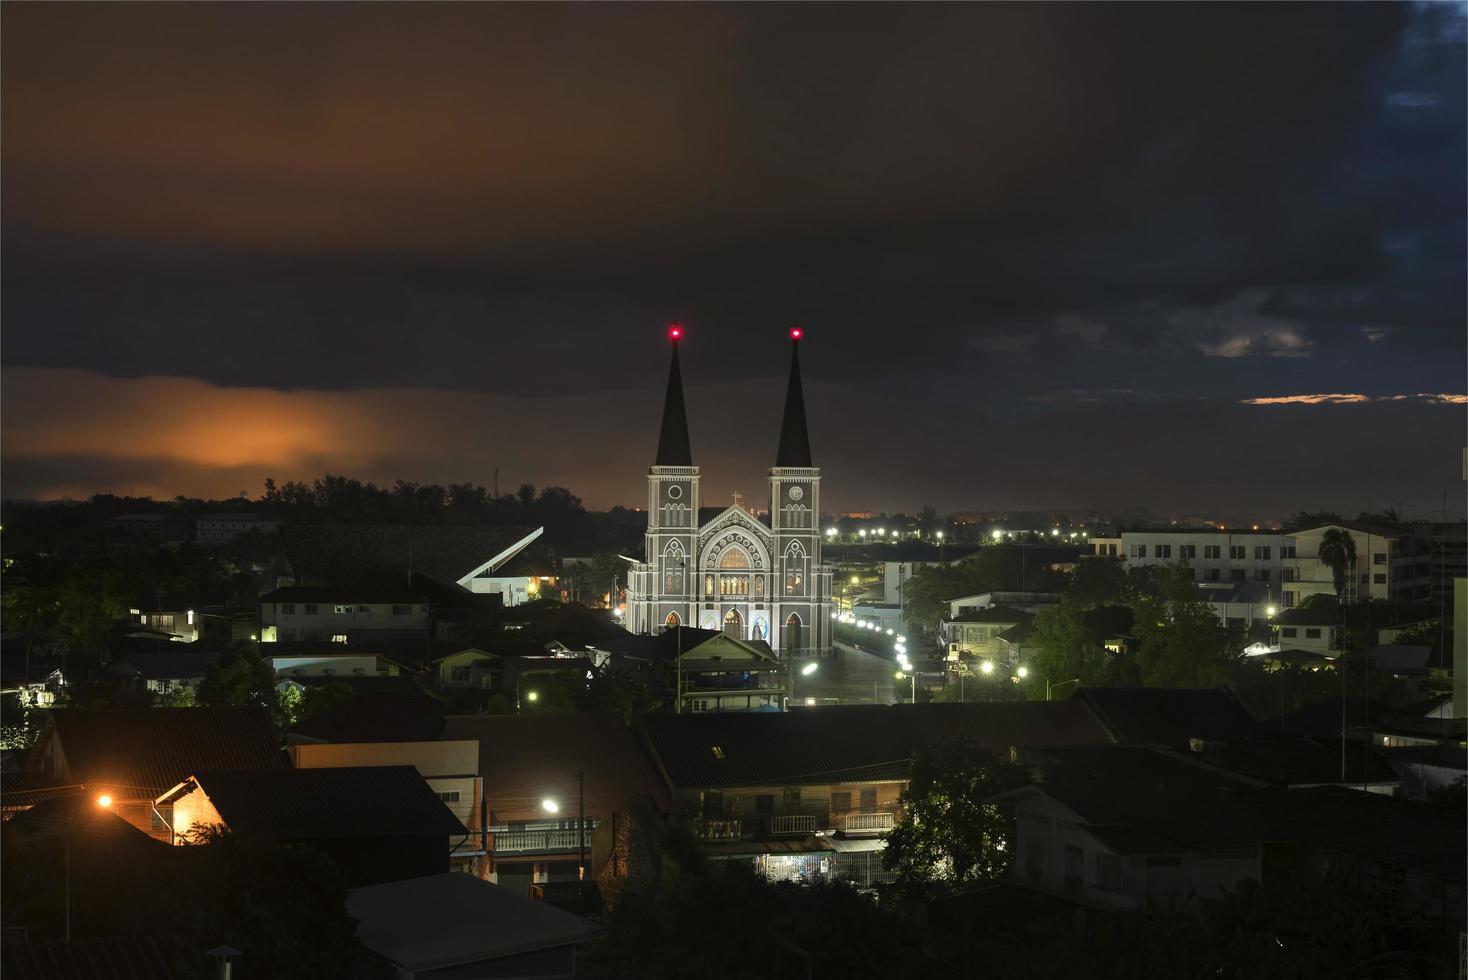 katolsk kyrka på natten foto